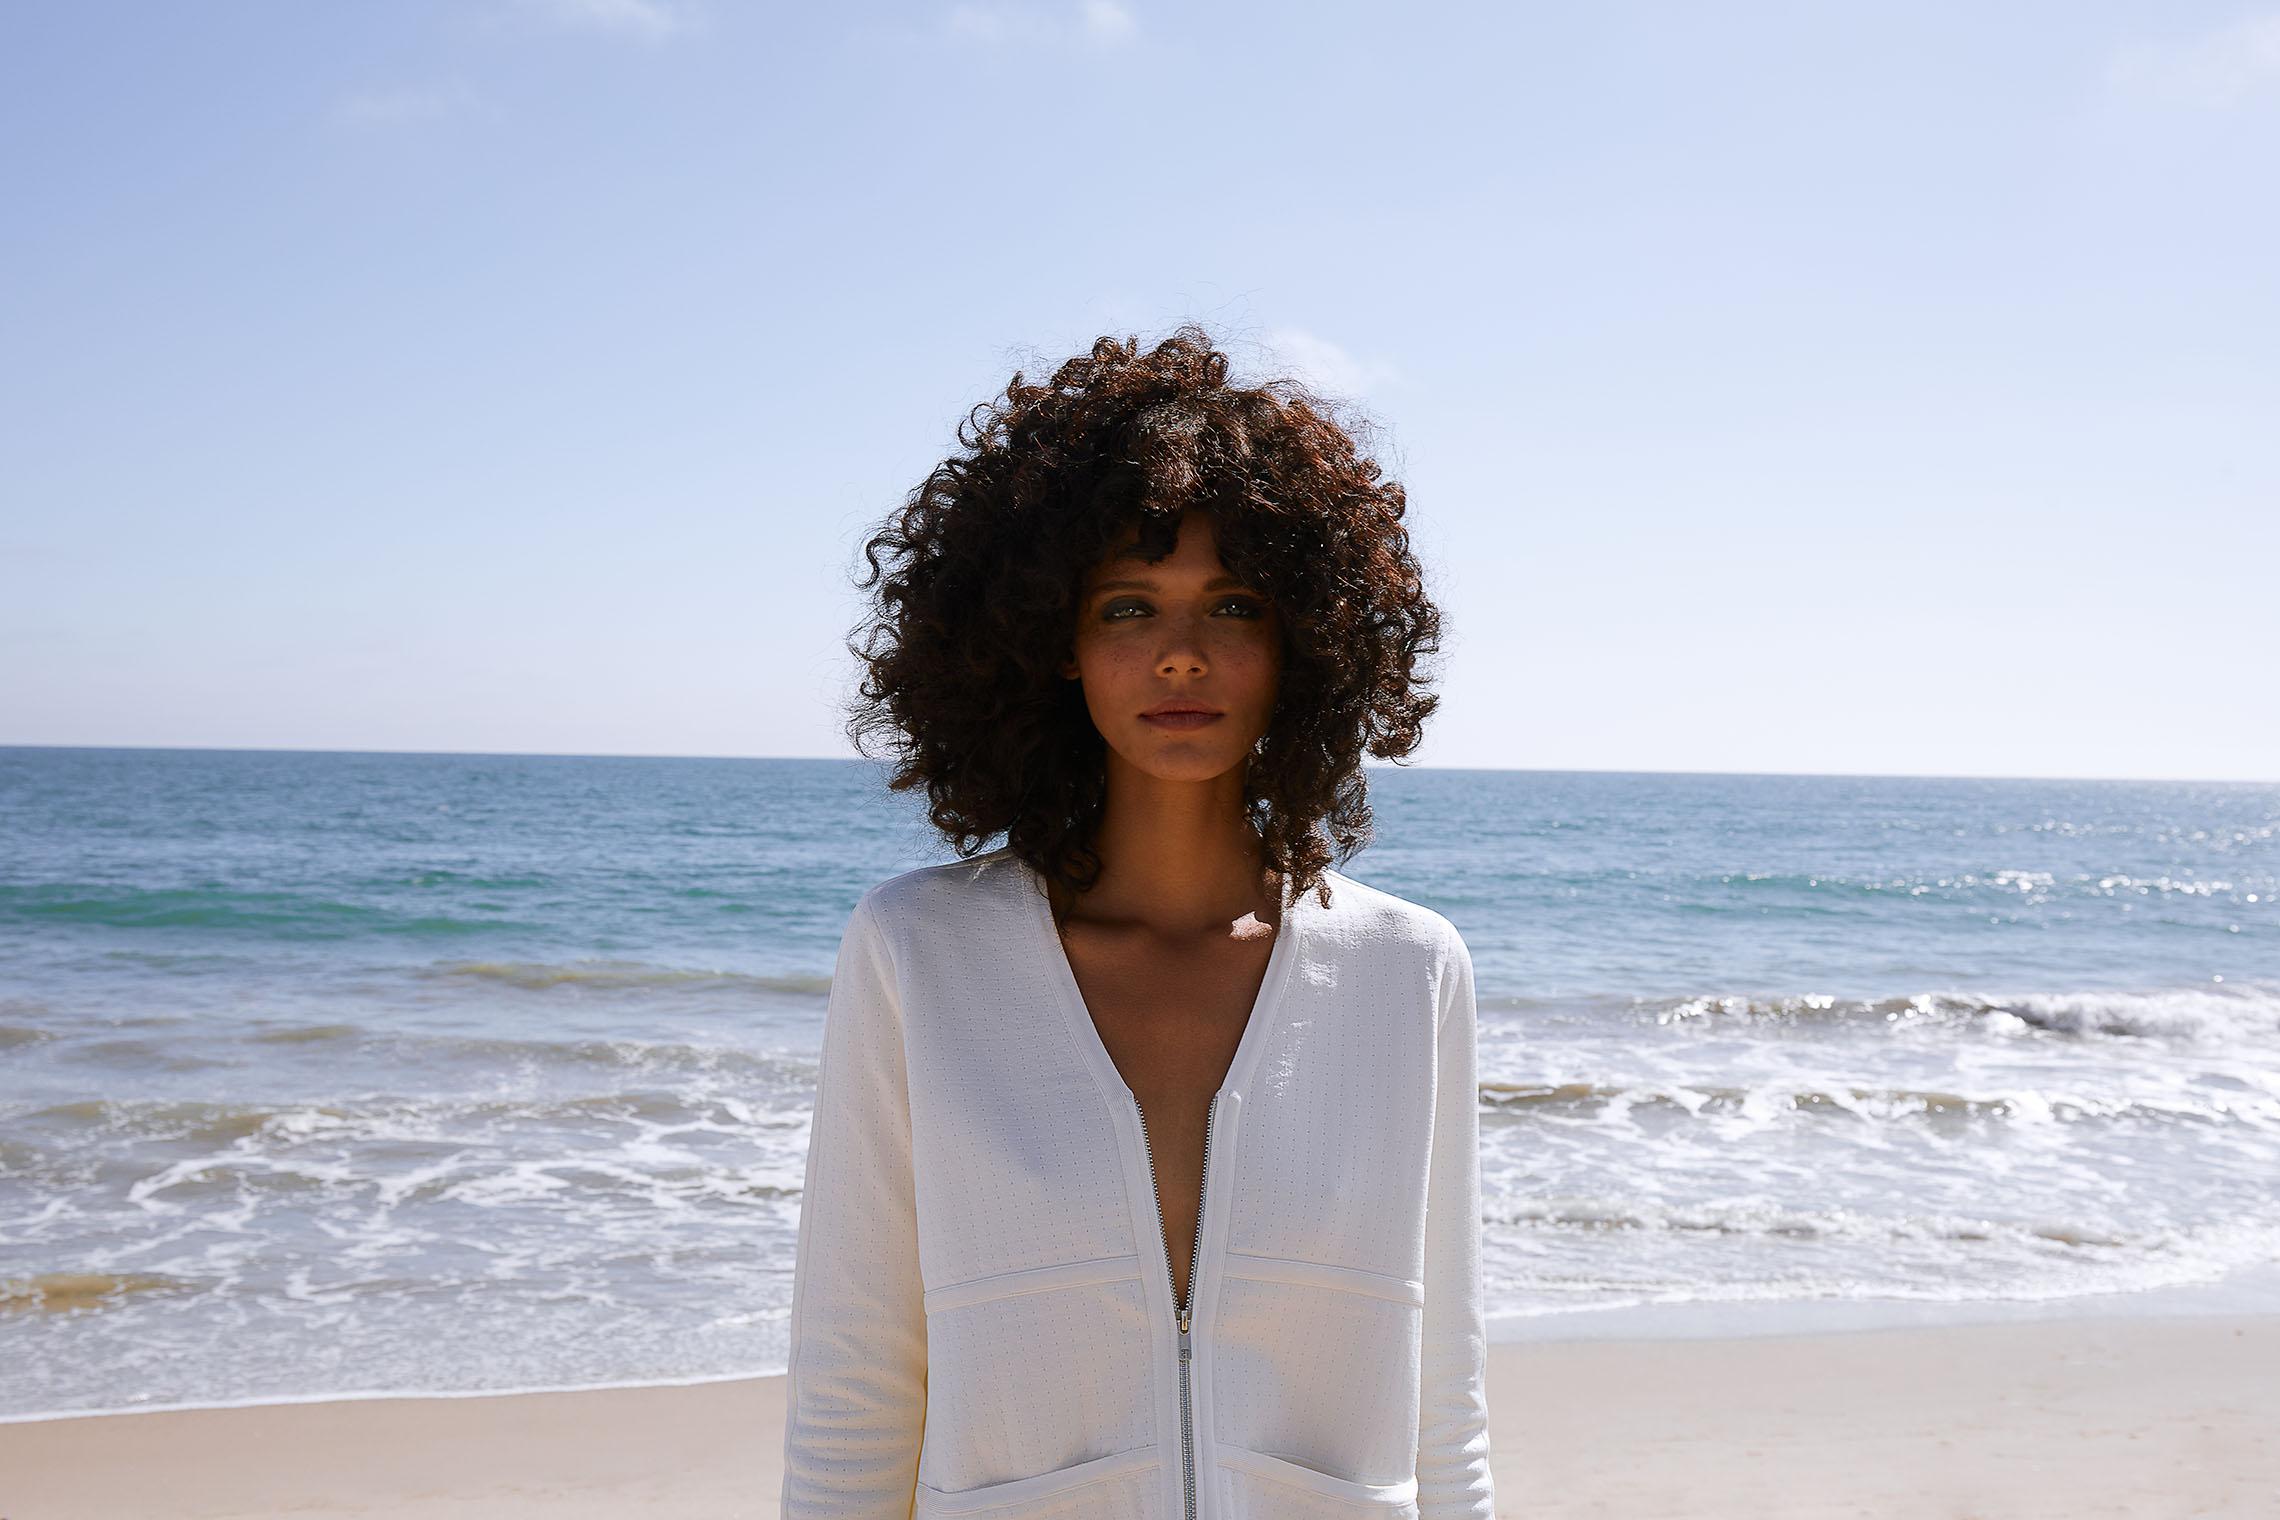 LA fashion photographer shoots fashion model at Pacific Ocean Coast-in-Malibu